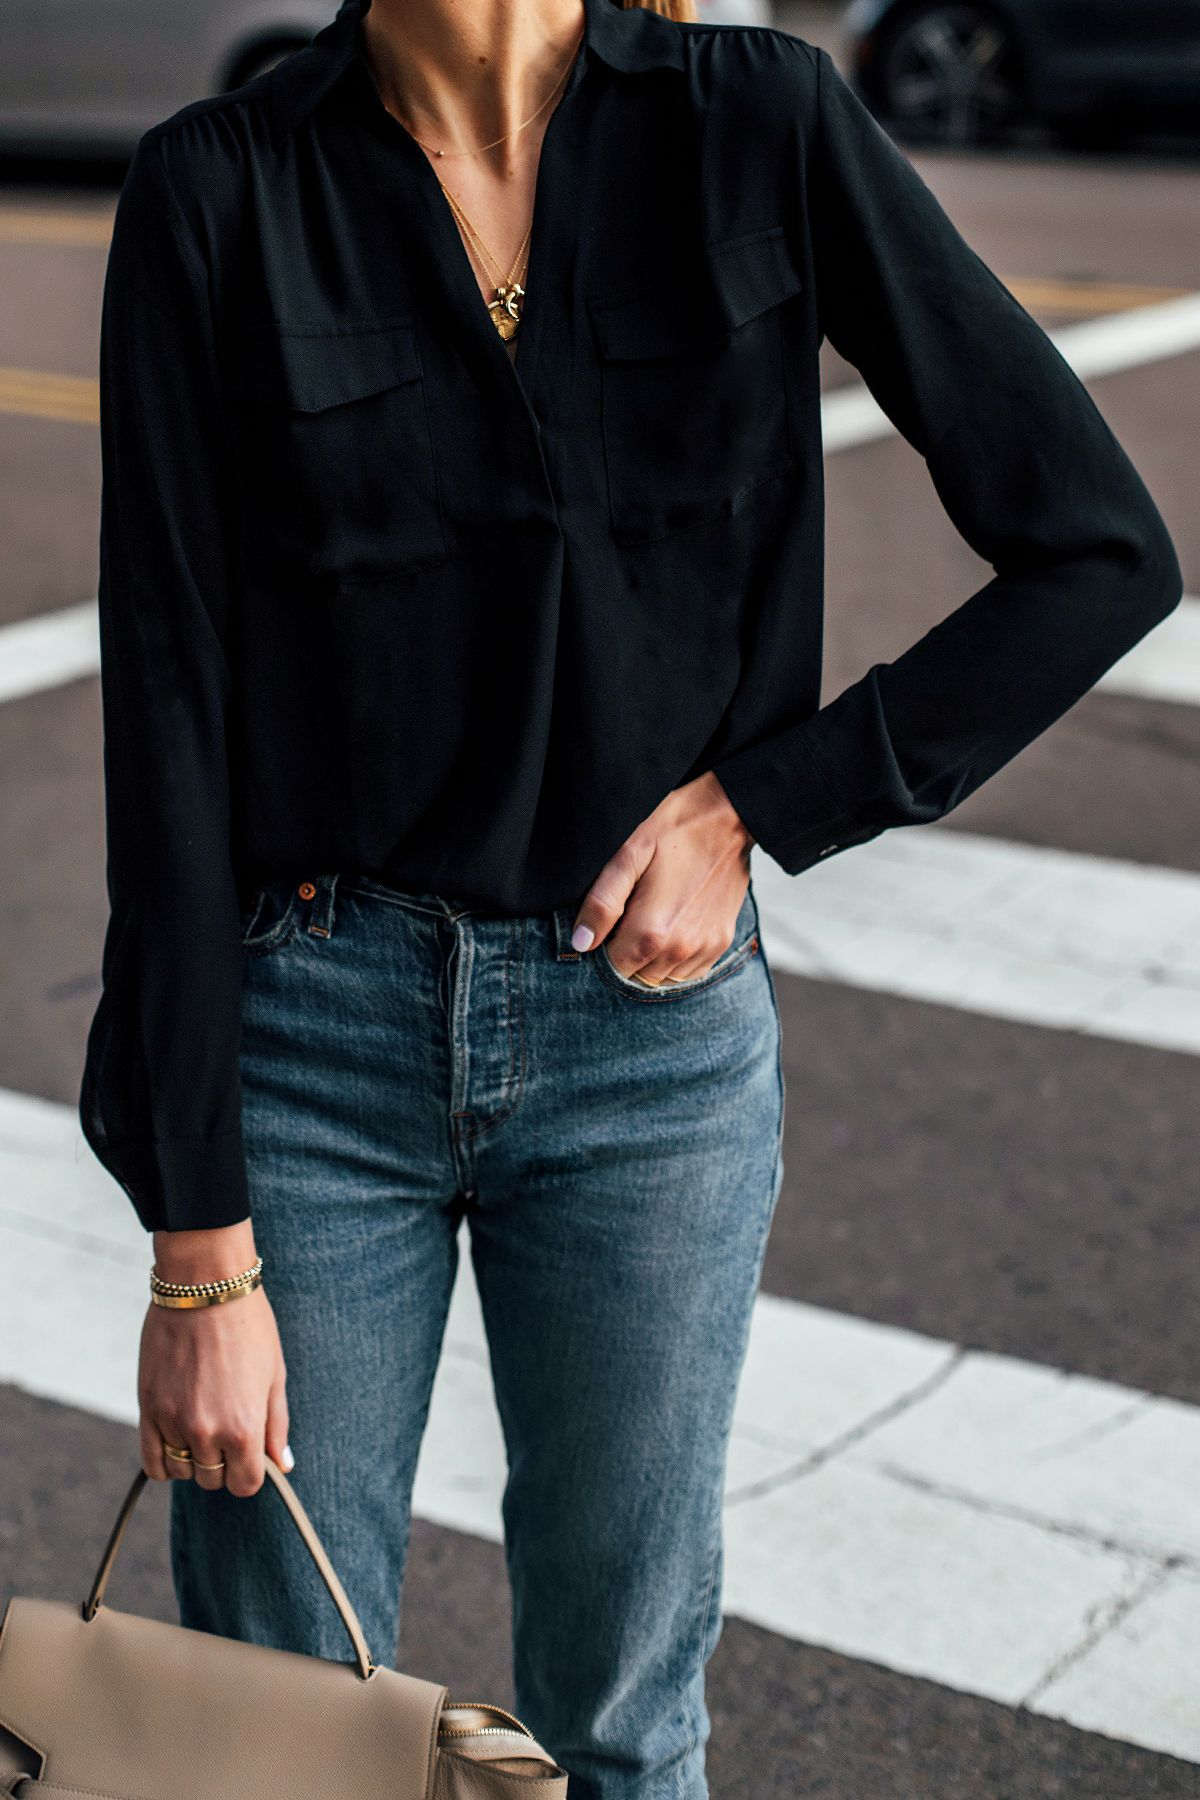 Woman Wearing Black Shirt Blouse Denim Jeans Fashion Jackson San Diego Fashion Blogger Street Style Casual Shirt Women Black Shirts Women Fashion Jackson